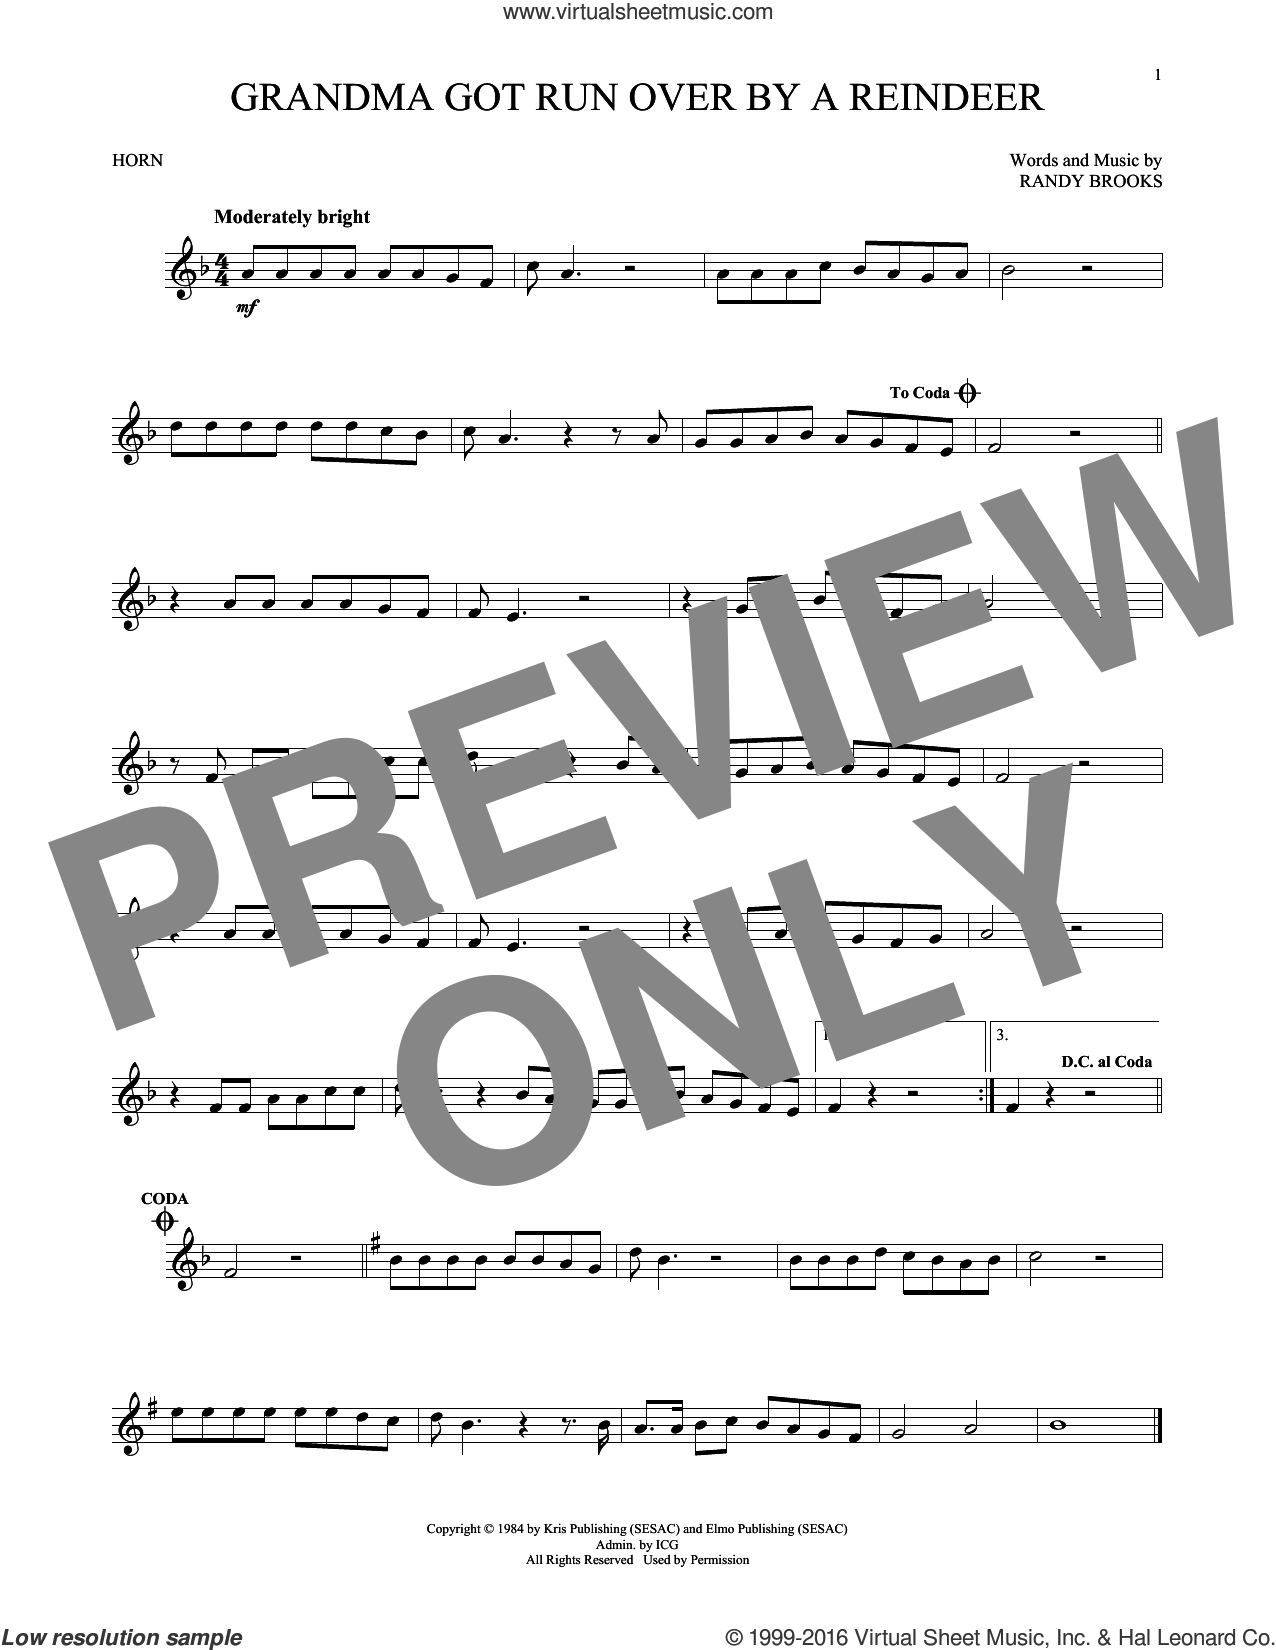 Grandma Got Run Over By A Reindeer sheet music for horn solo by Randy Brooks, intermediate skill level